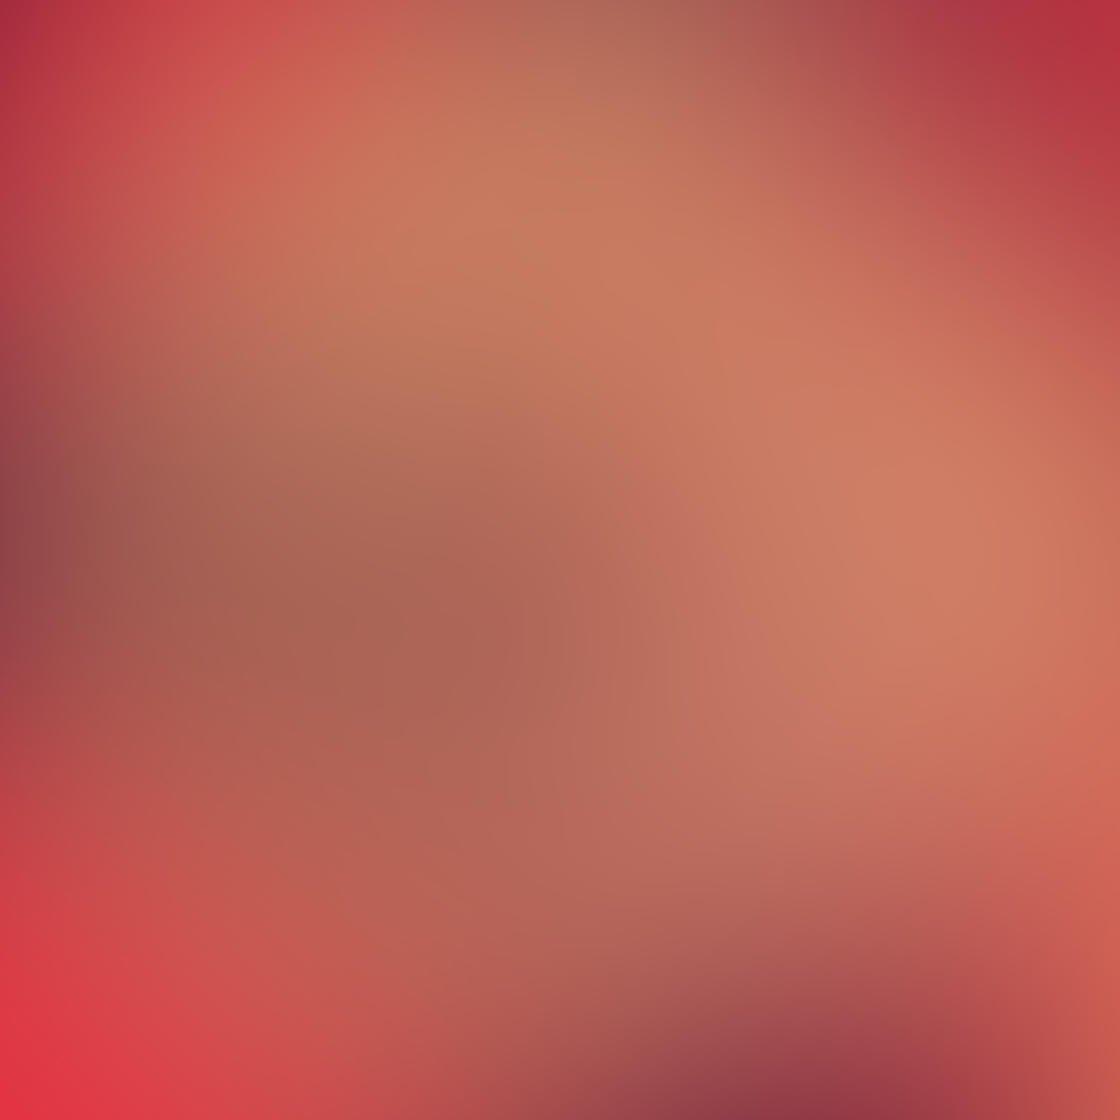 Ordinary iPhone Photo Subjects 6